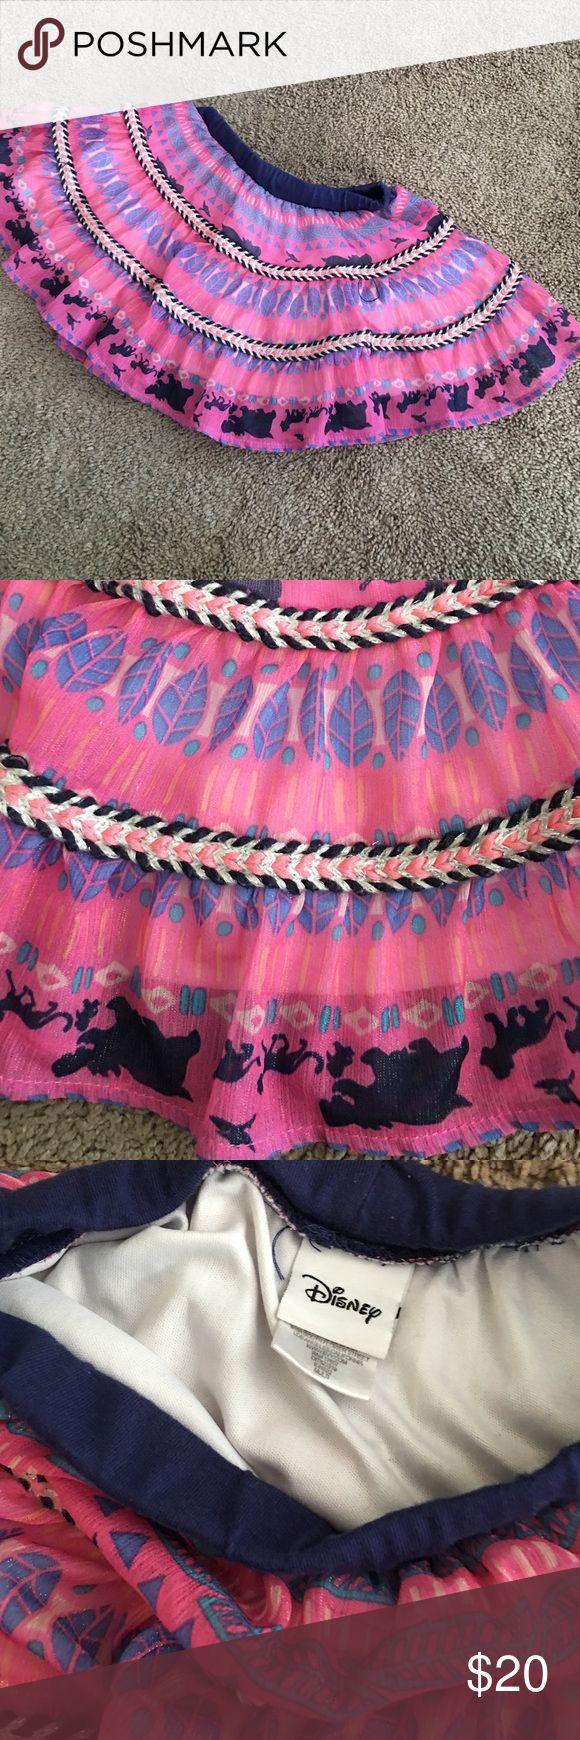 Disney TUTU skirt Really cute Disney tutu skirt rare hard to find.. Size 4T. Disney Bottoms Skirts